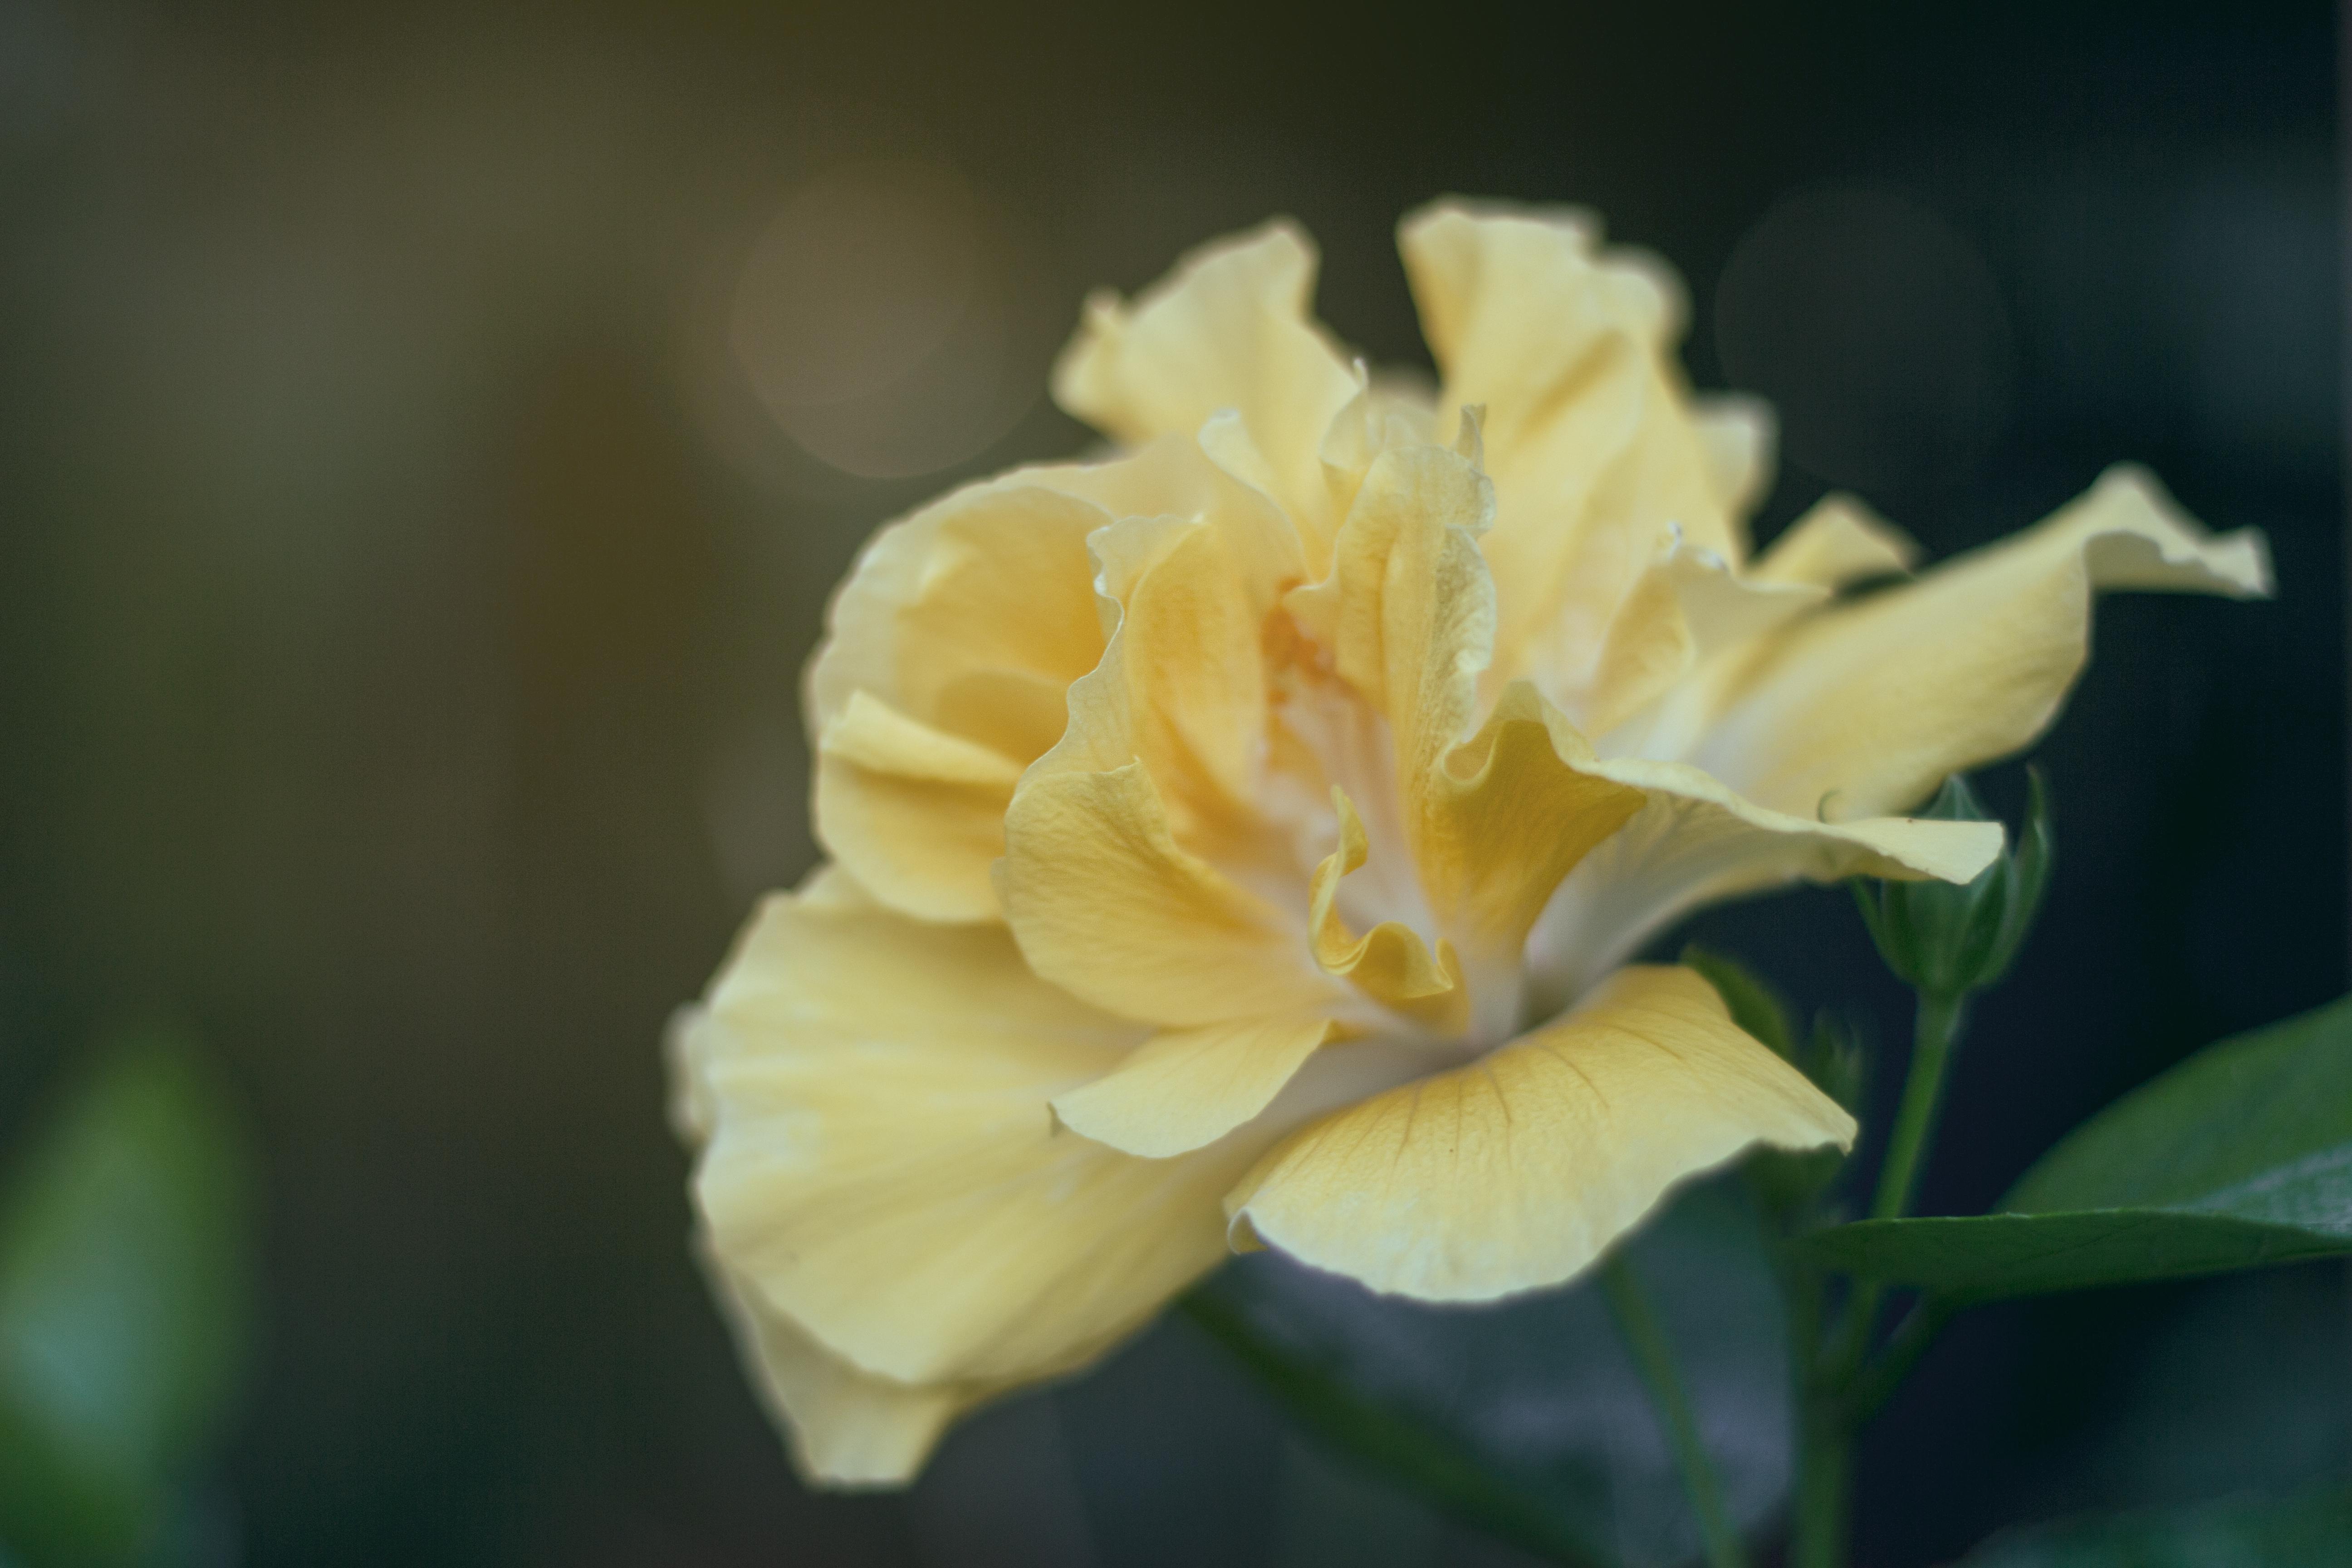 Gambar Mekar Menanam Daun Bunga Berkembang Botani Kuning